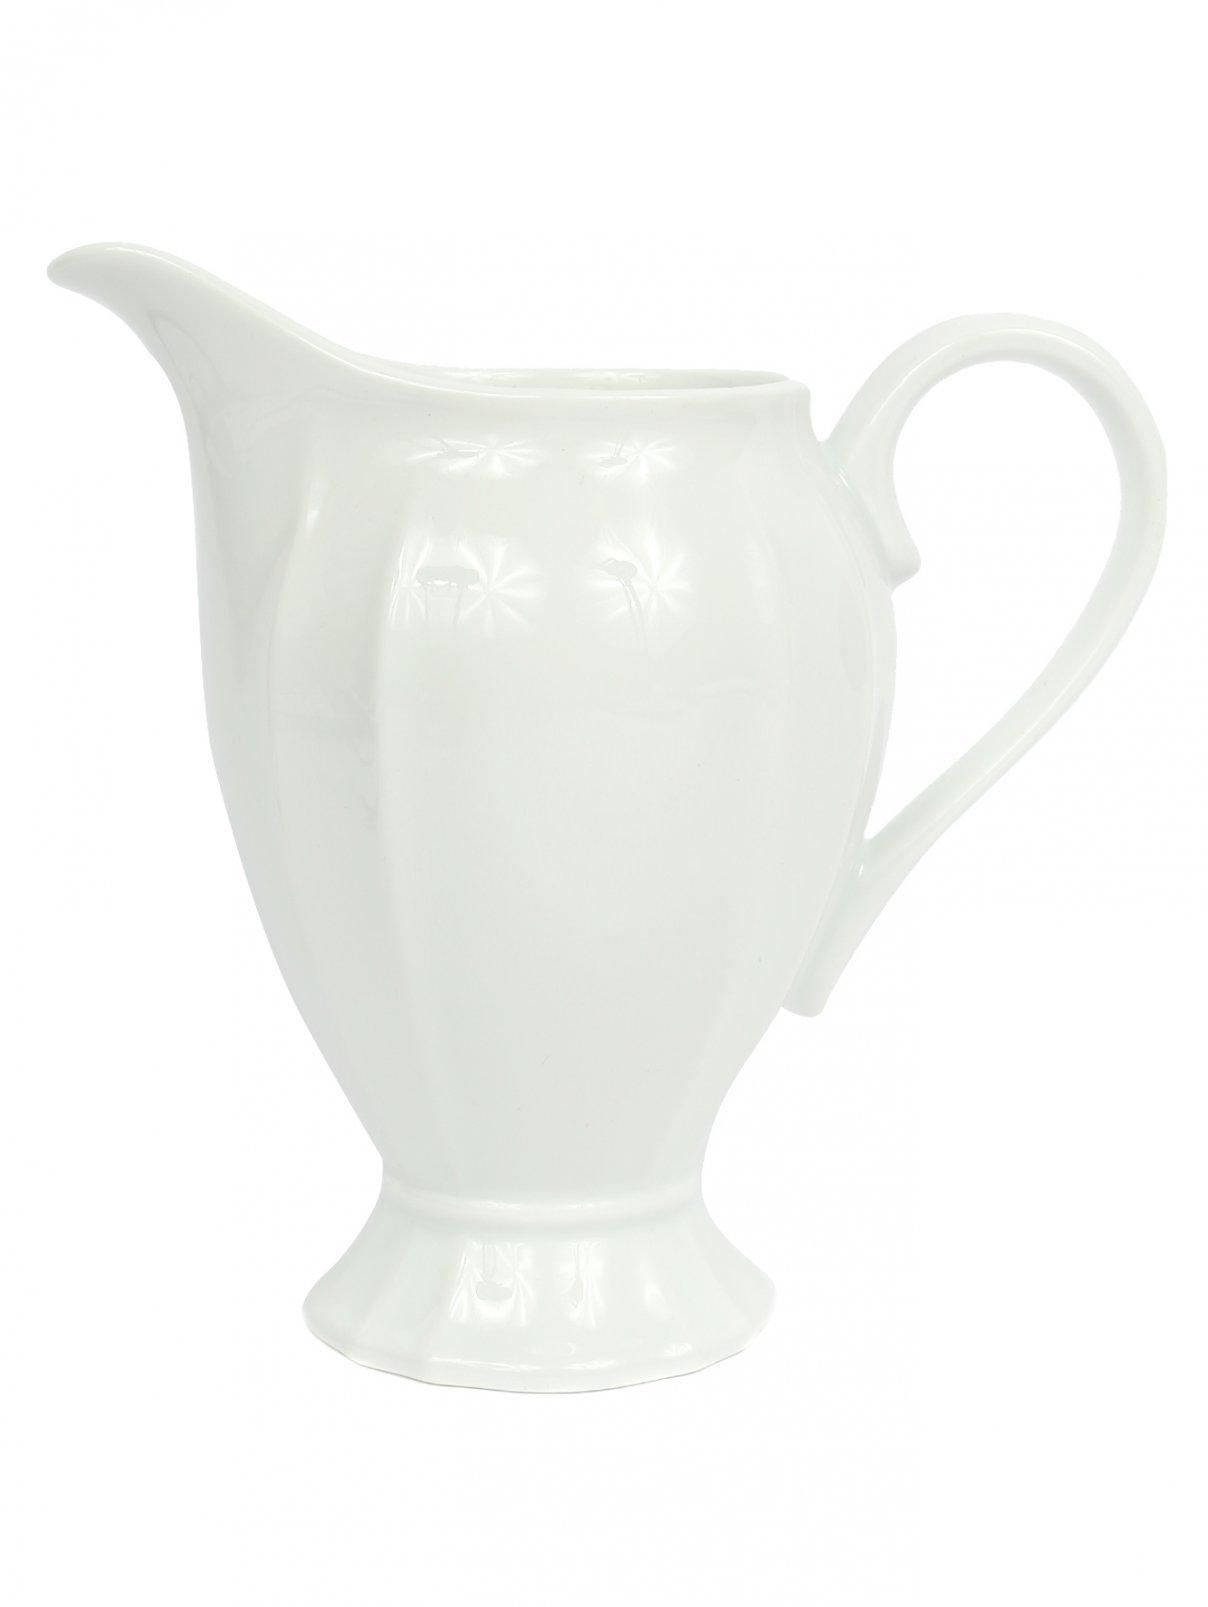 Молочник Richard Ginori 1735  –  Общий вид